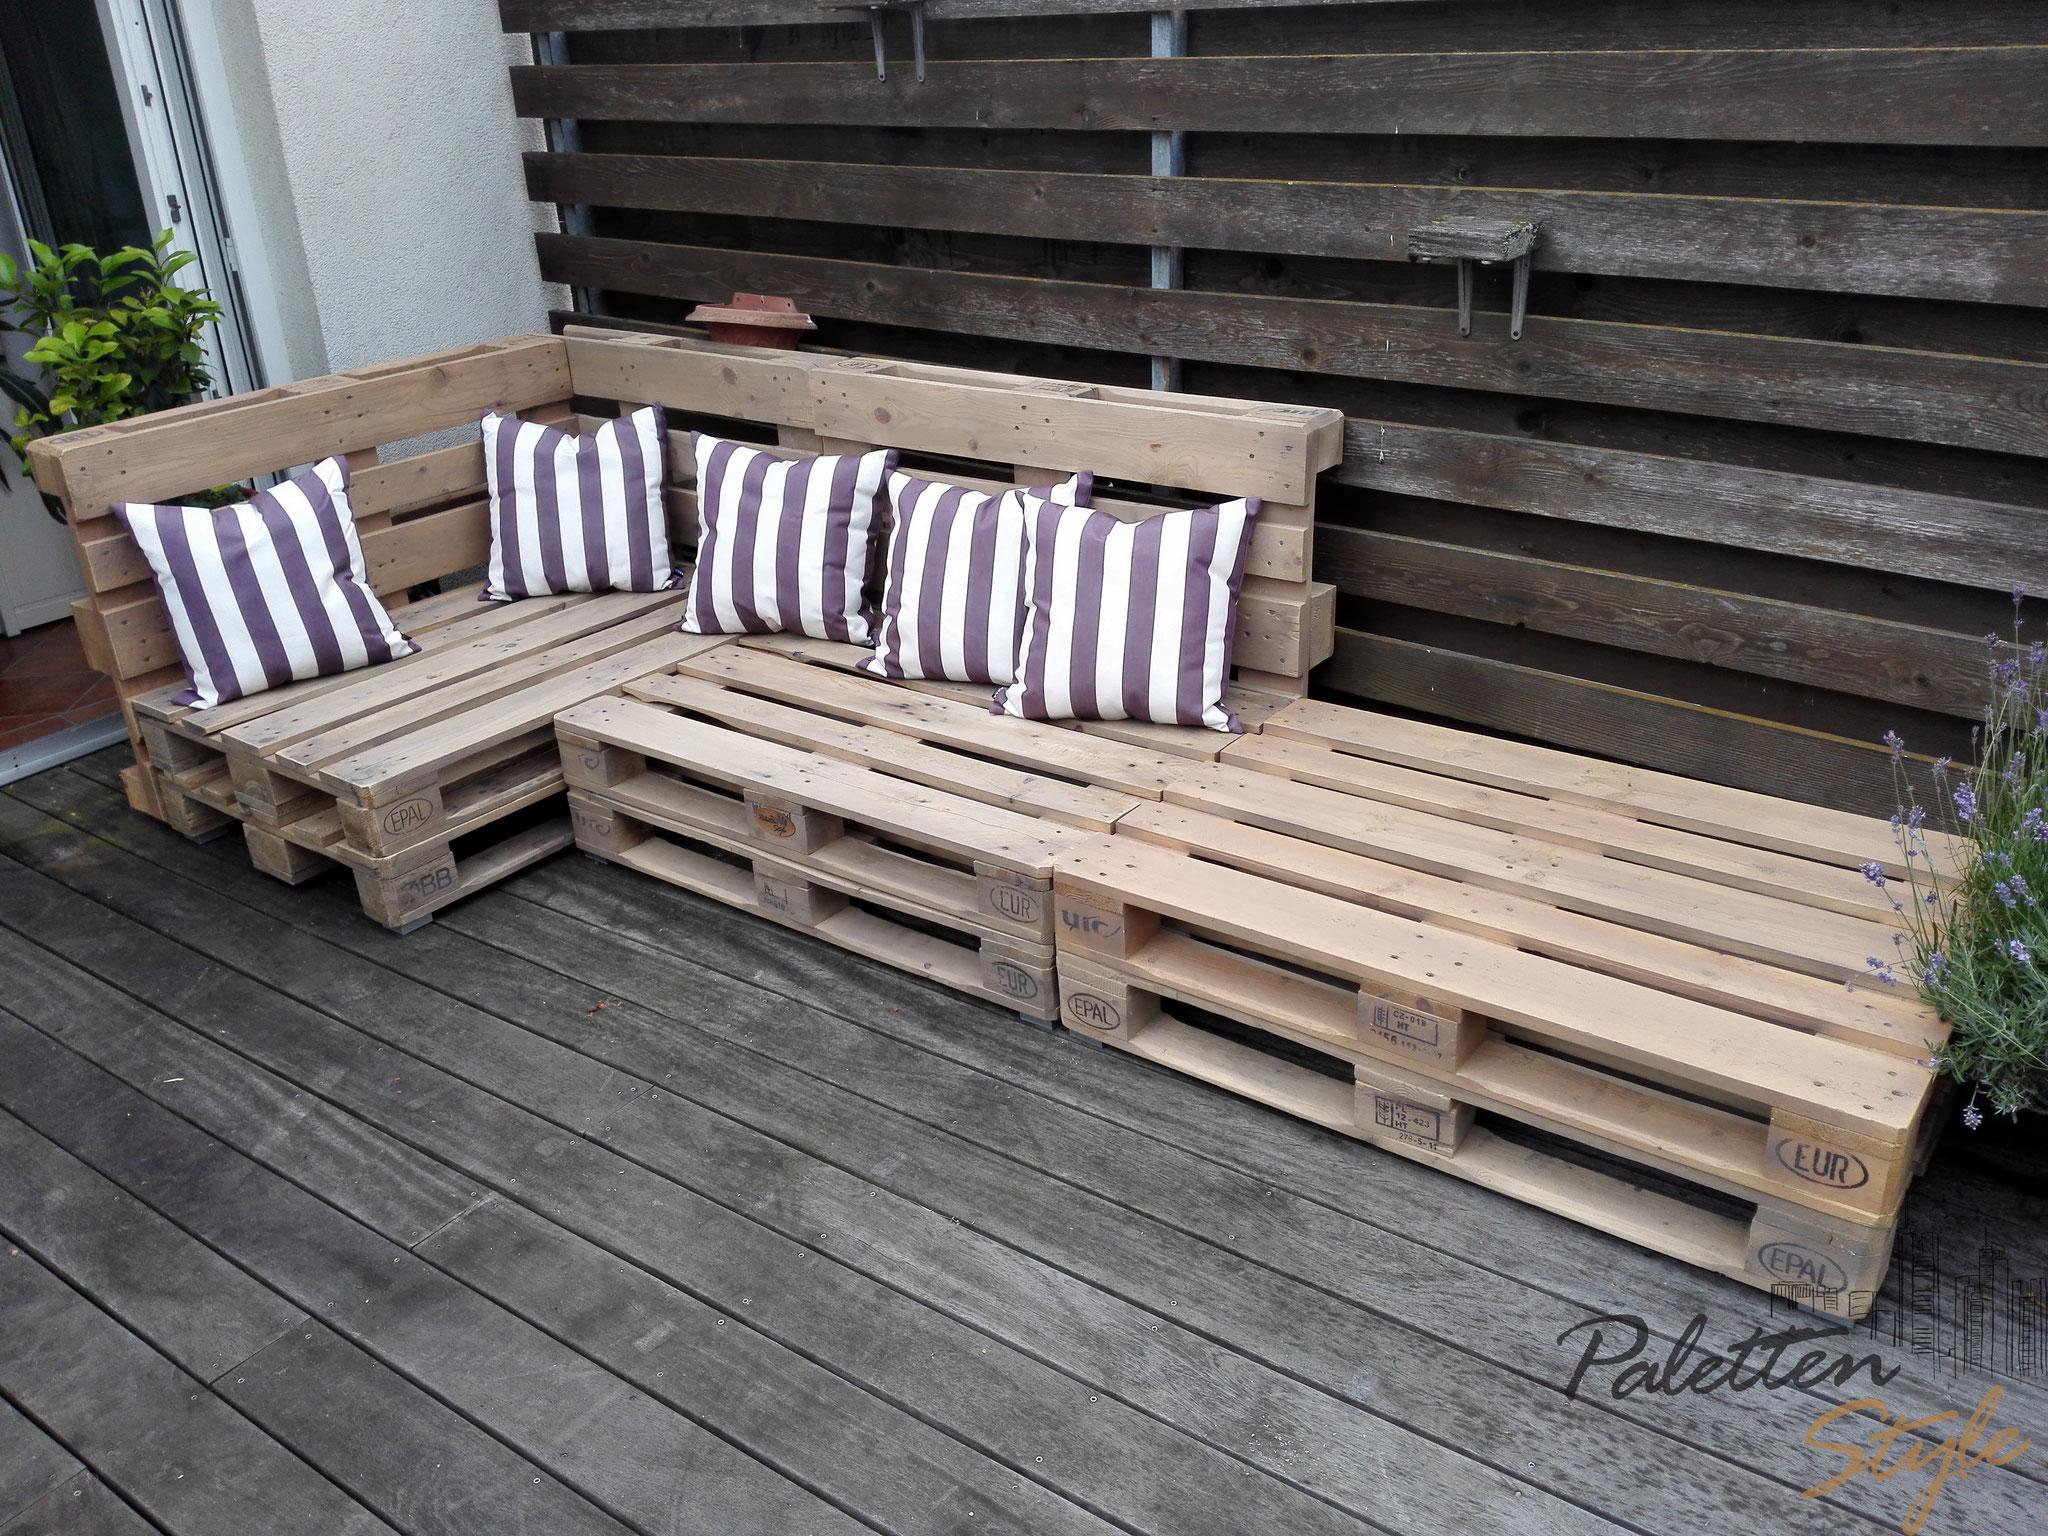 Möbel aus Europaletten-Palettenmöbel - Paletten-Style